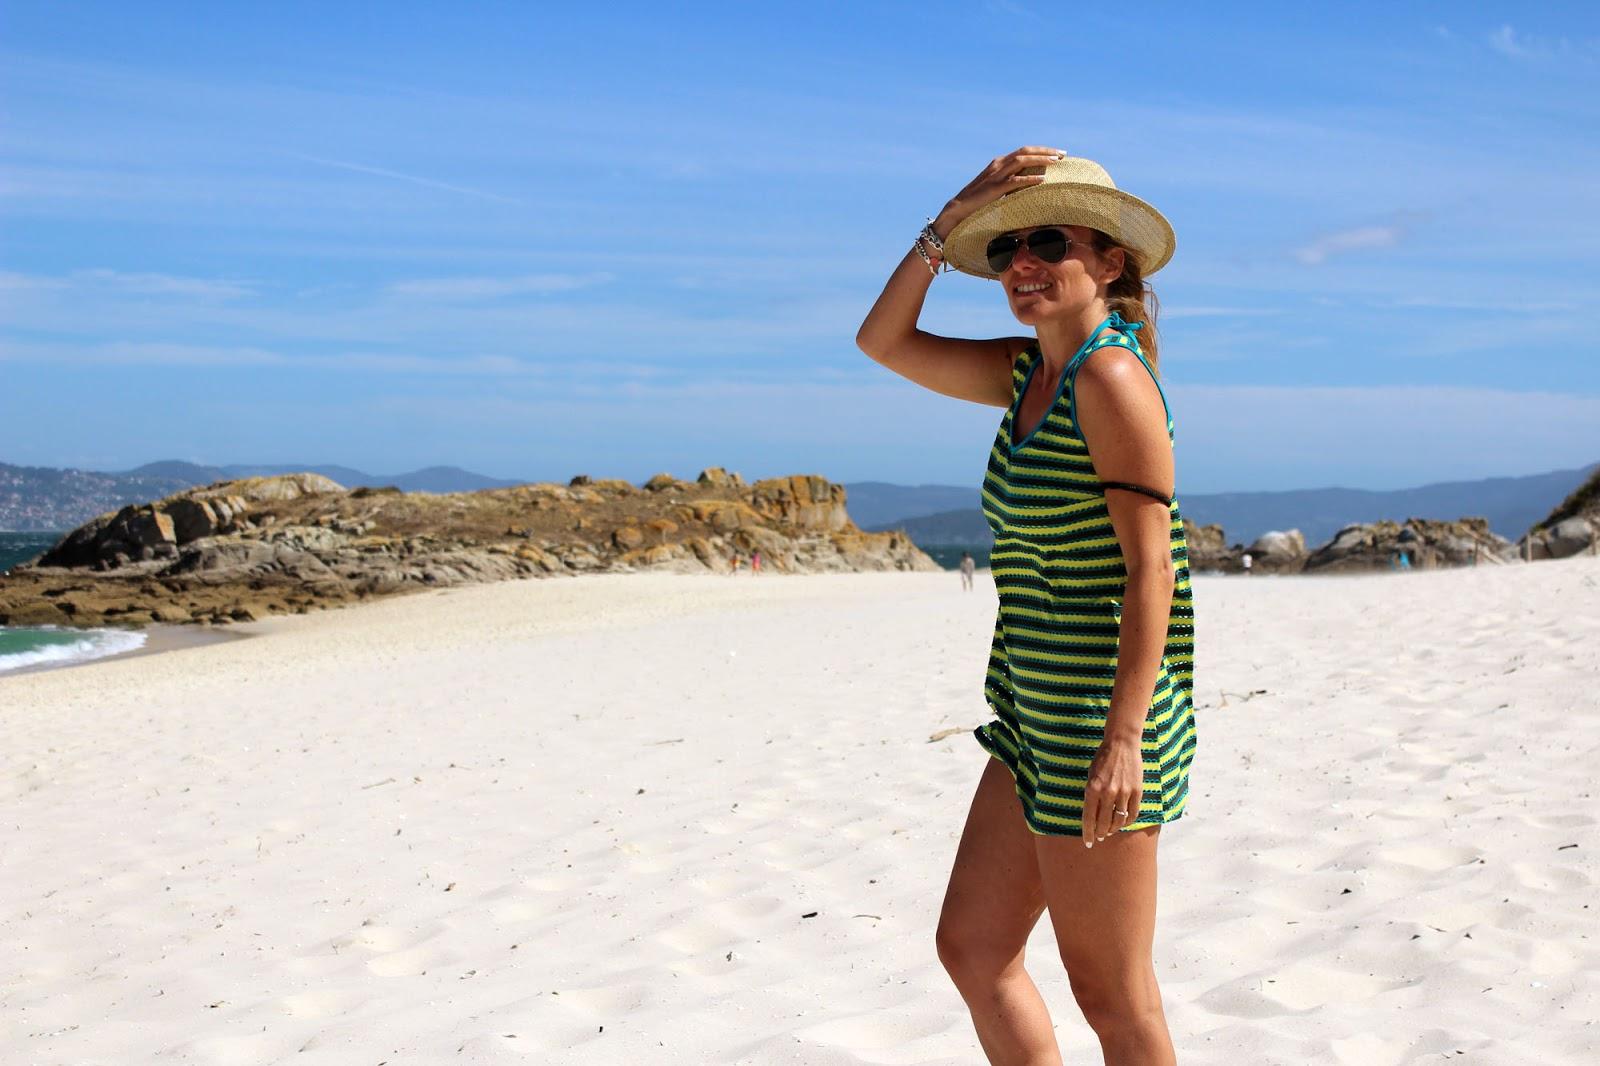 Eniwhere Fashion - Isla Cies Vigo - Giadamarina